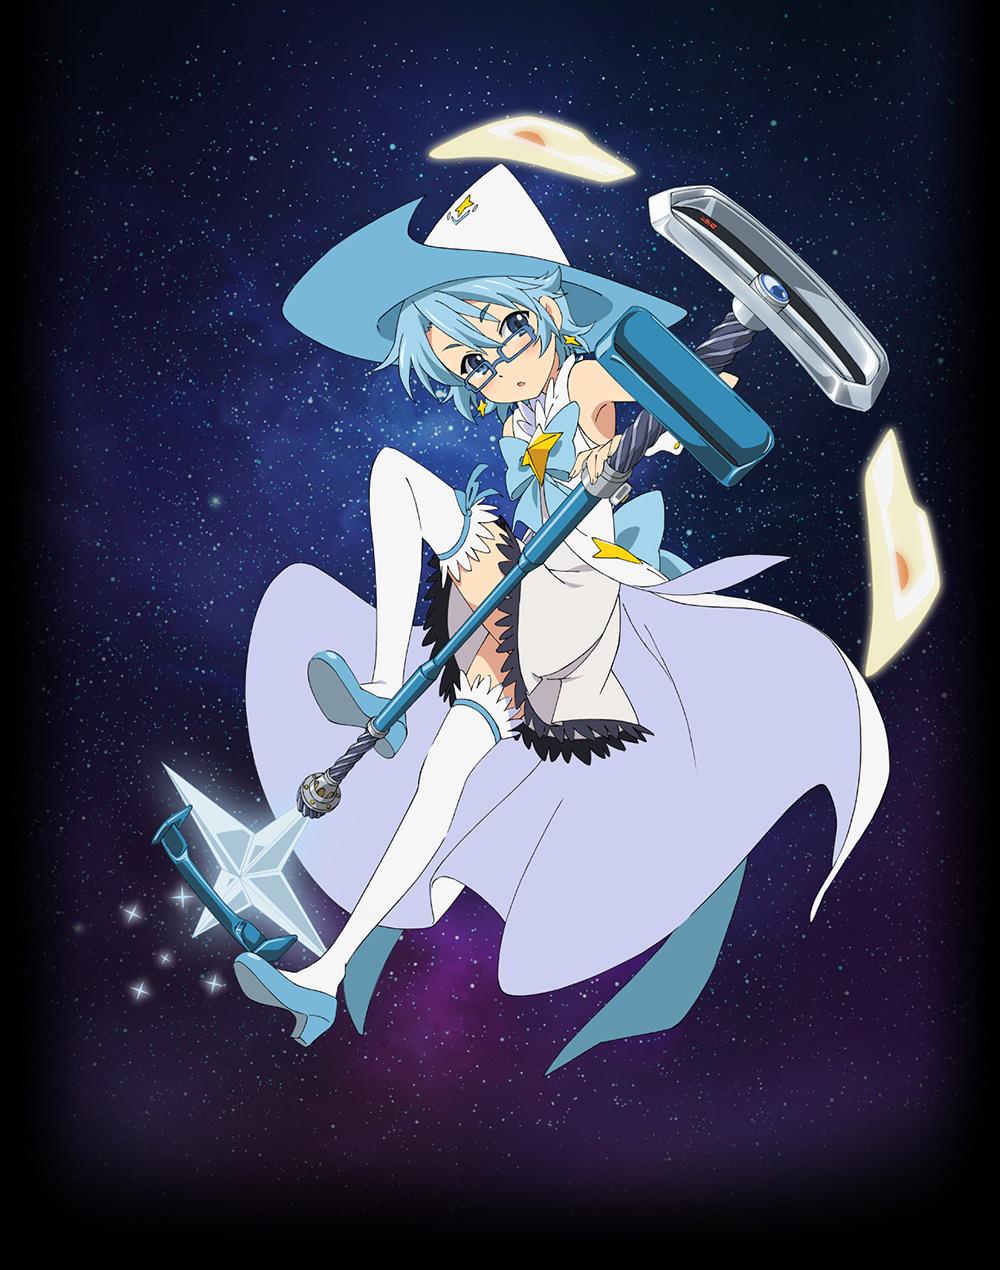 Houkago-no-Pleiades-TV-Anime-Character-Visual-Aoi